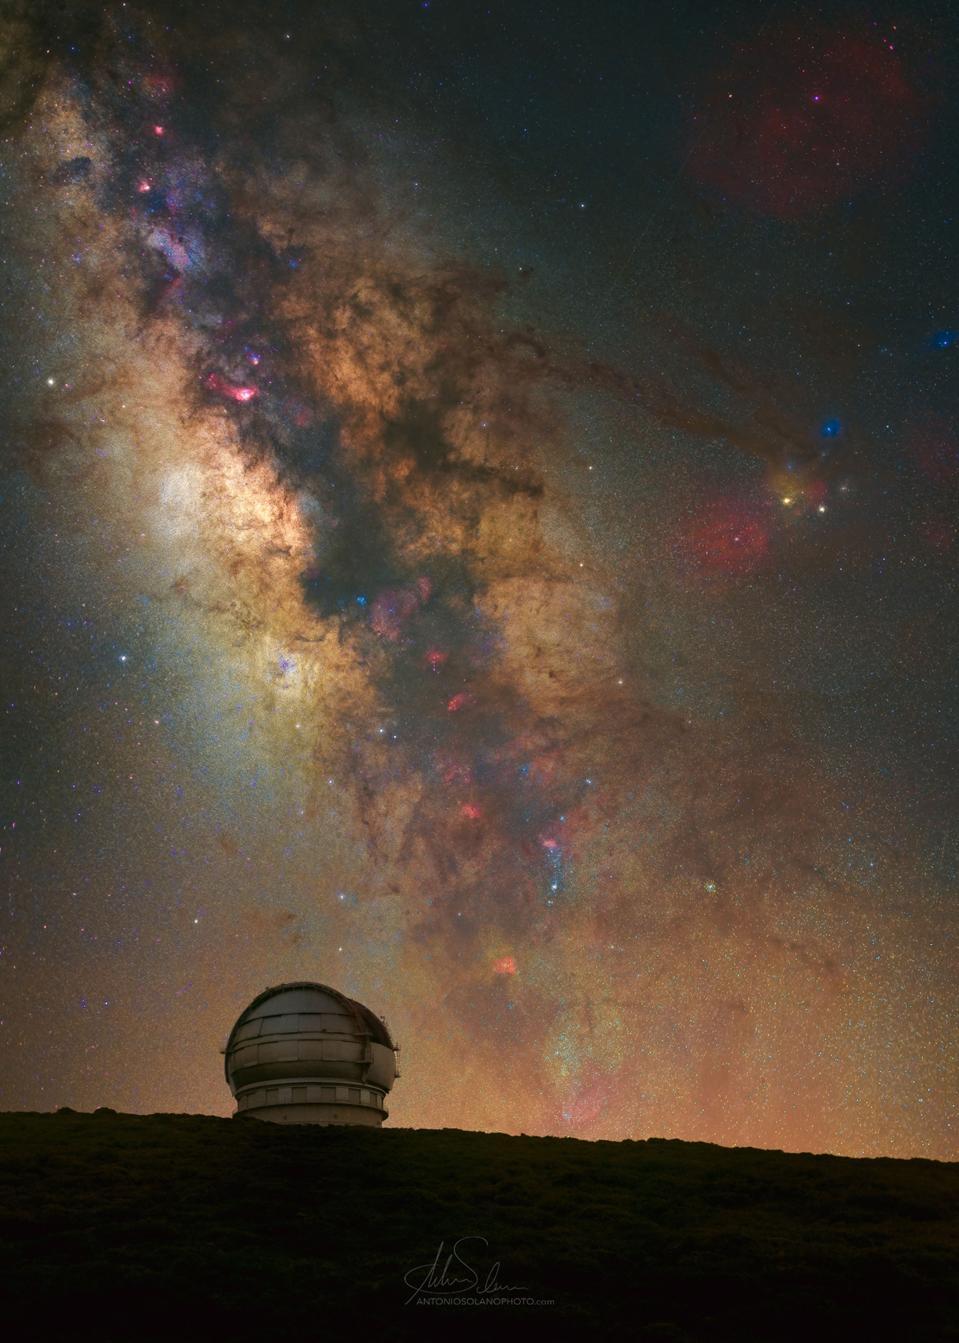 La Palma, Canary Islands, Spain stargazing